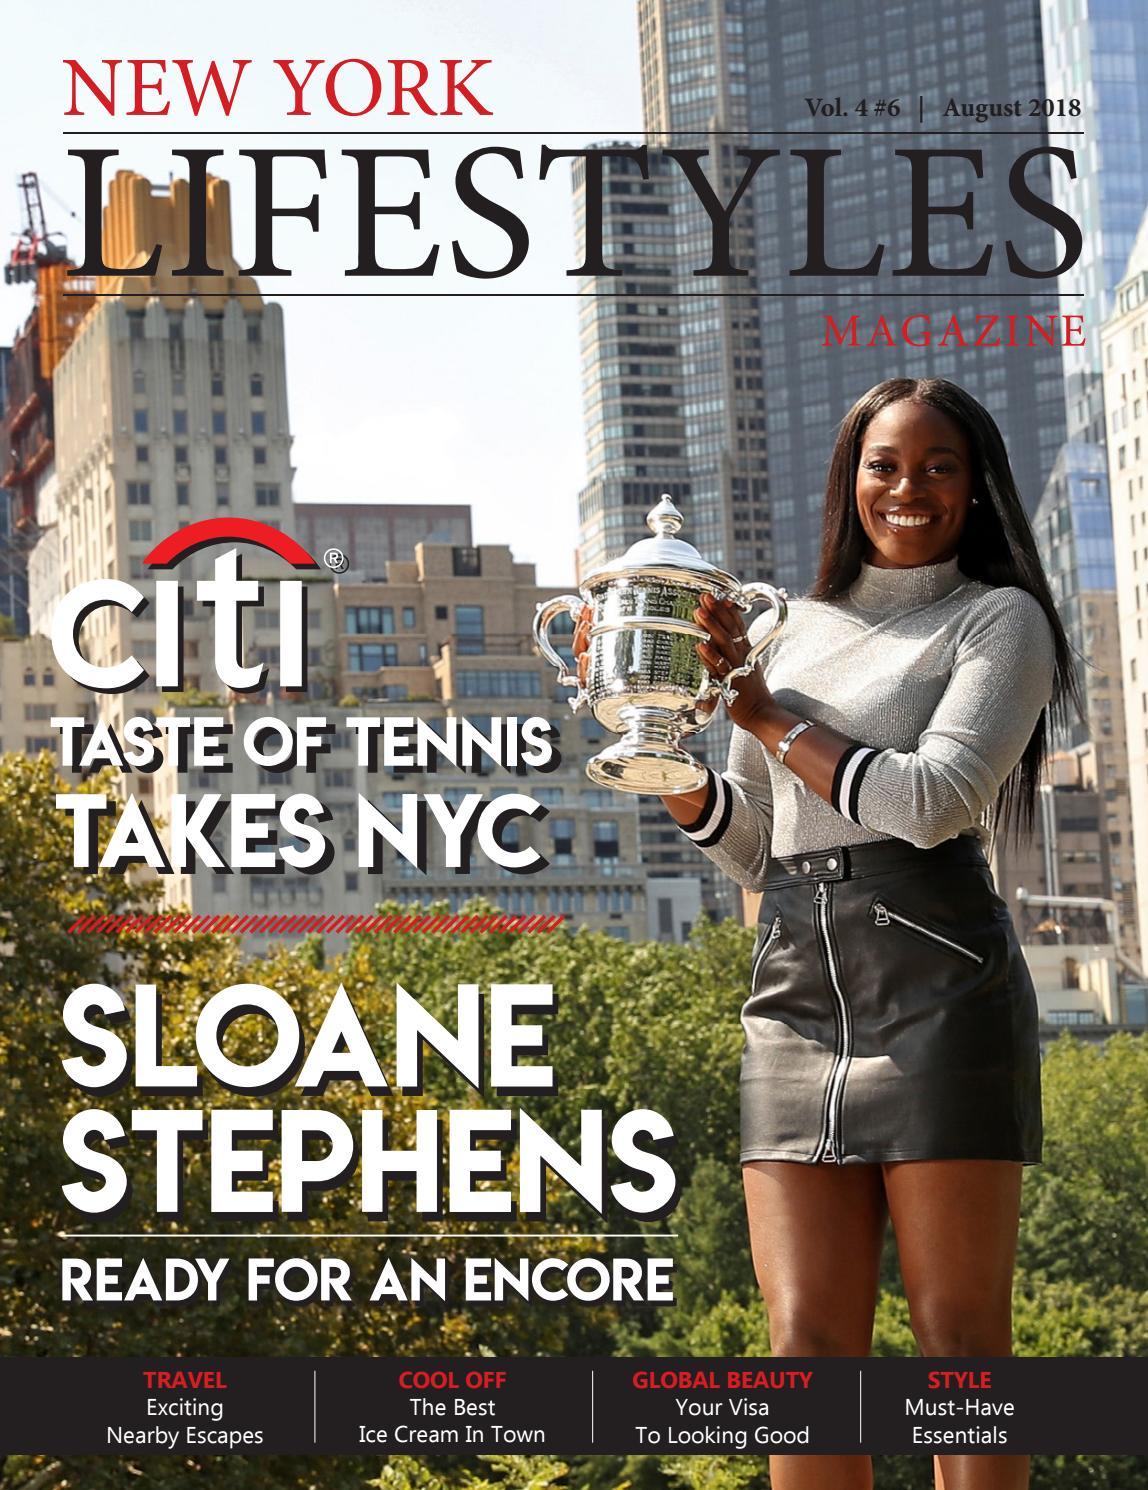 New York Lifestyles Magazine - August 2018 by New York Lifestyles Magazine  - issuu